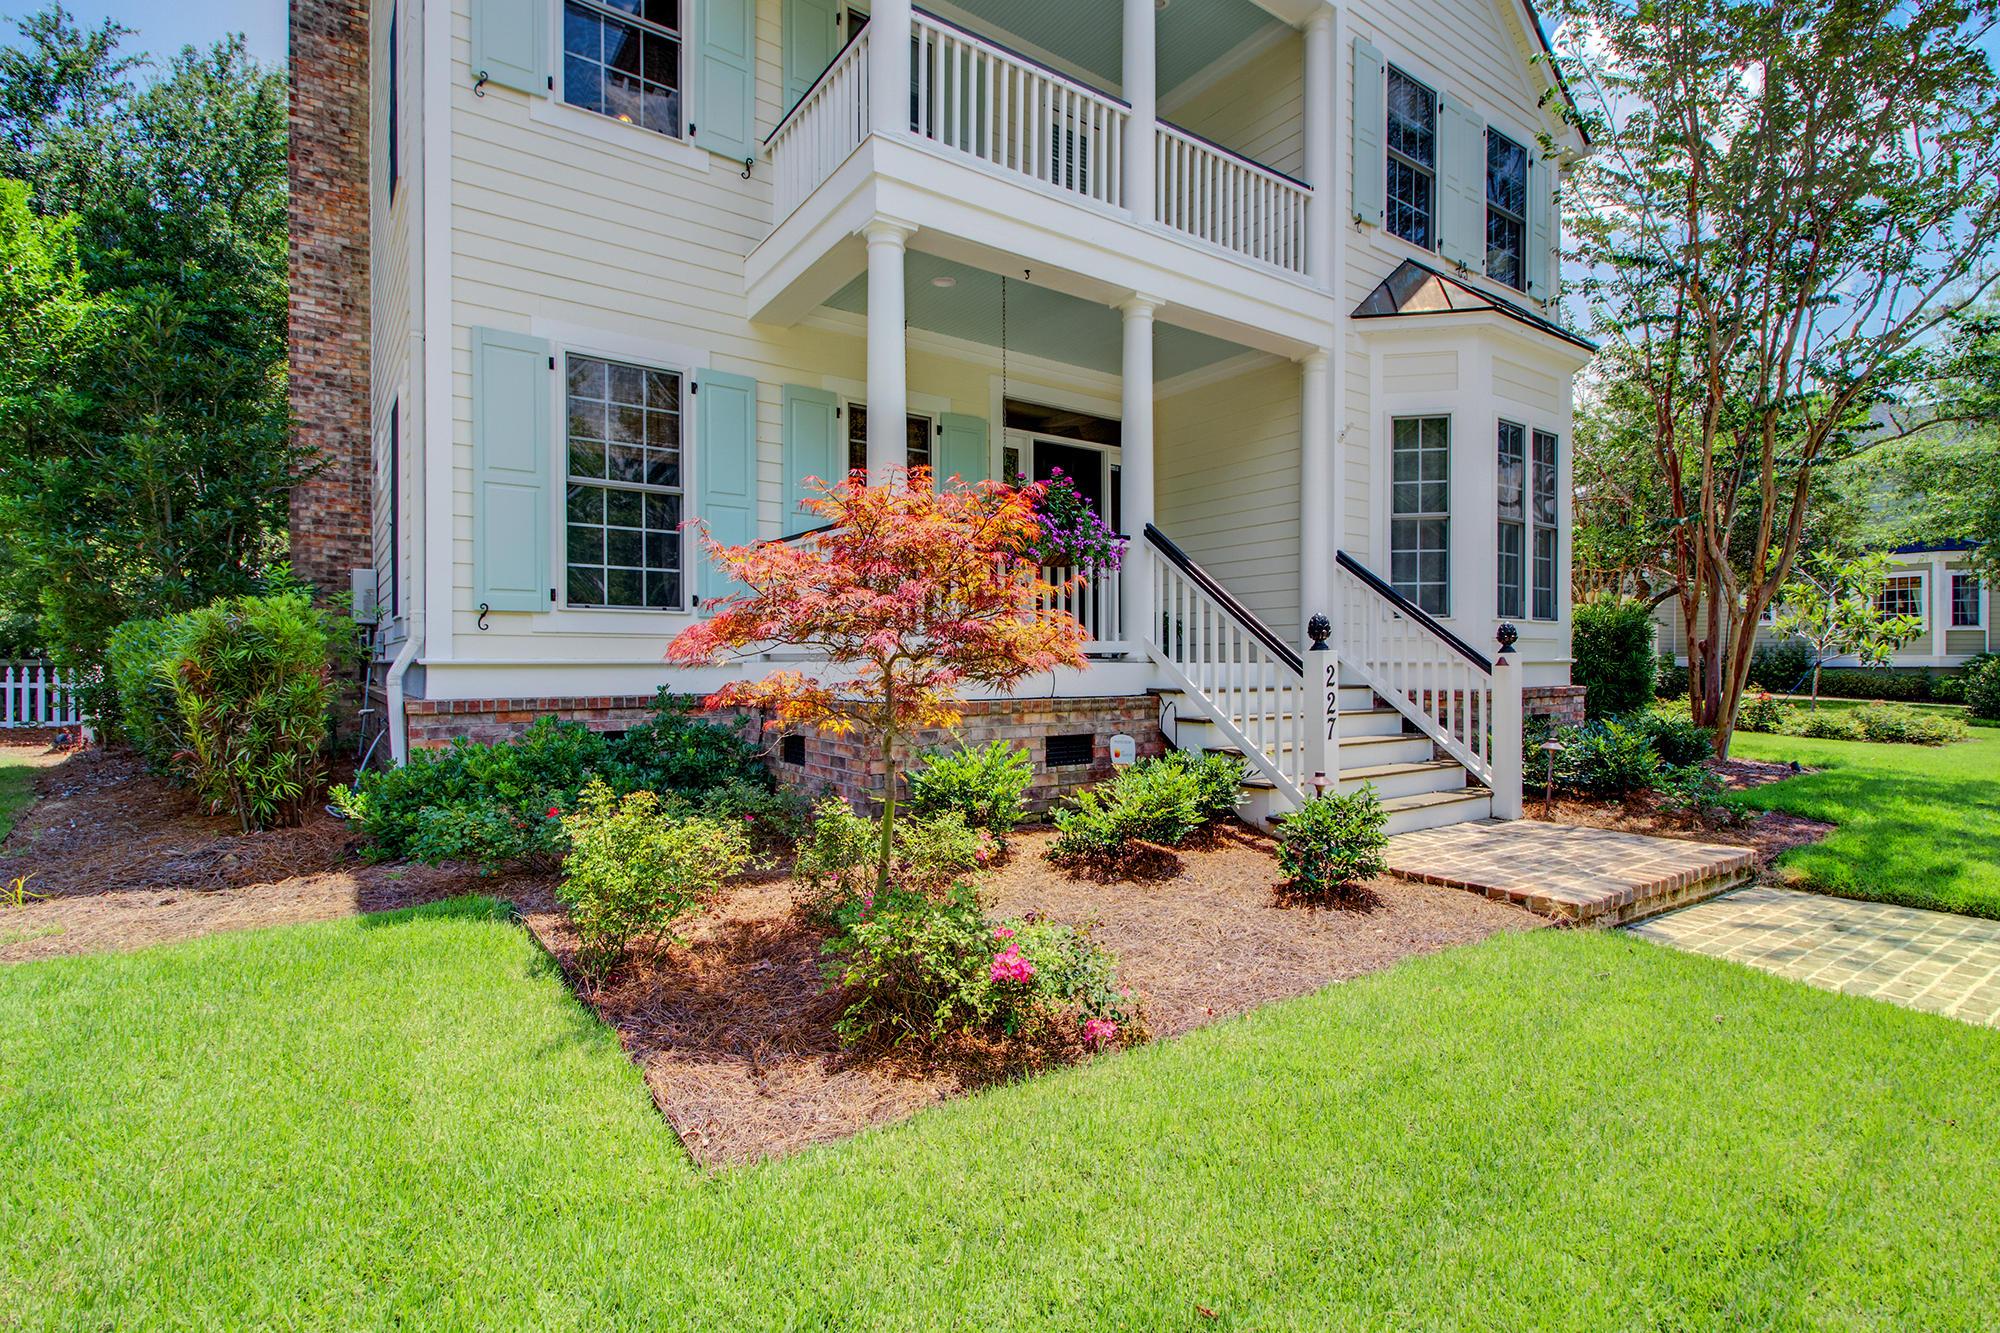 Codners Ferry Park Homes For Sale - 227 Fairchild, Daniel Island, SC - 50